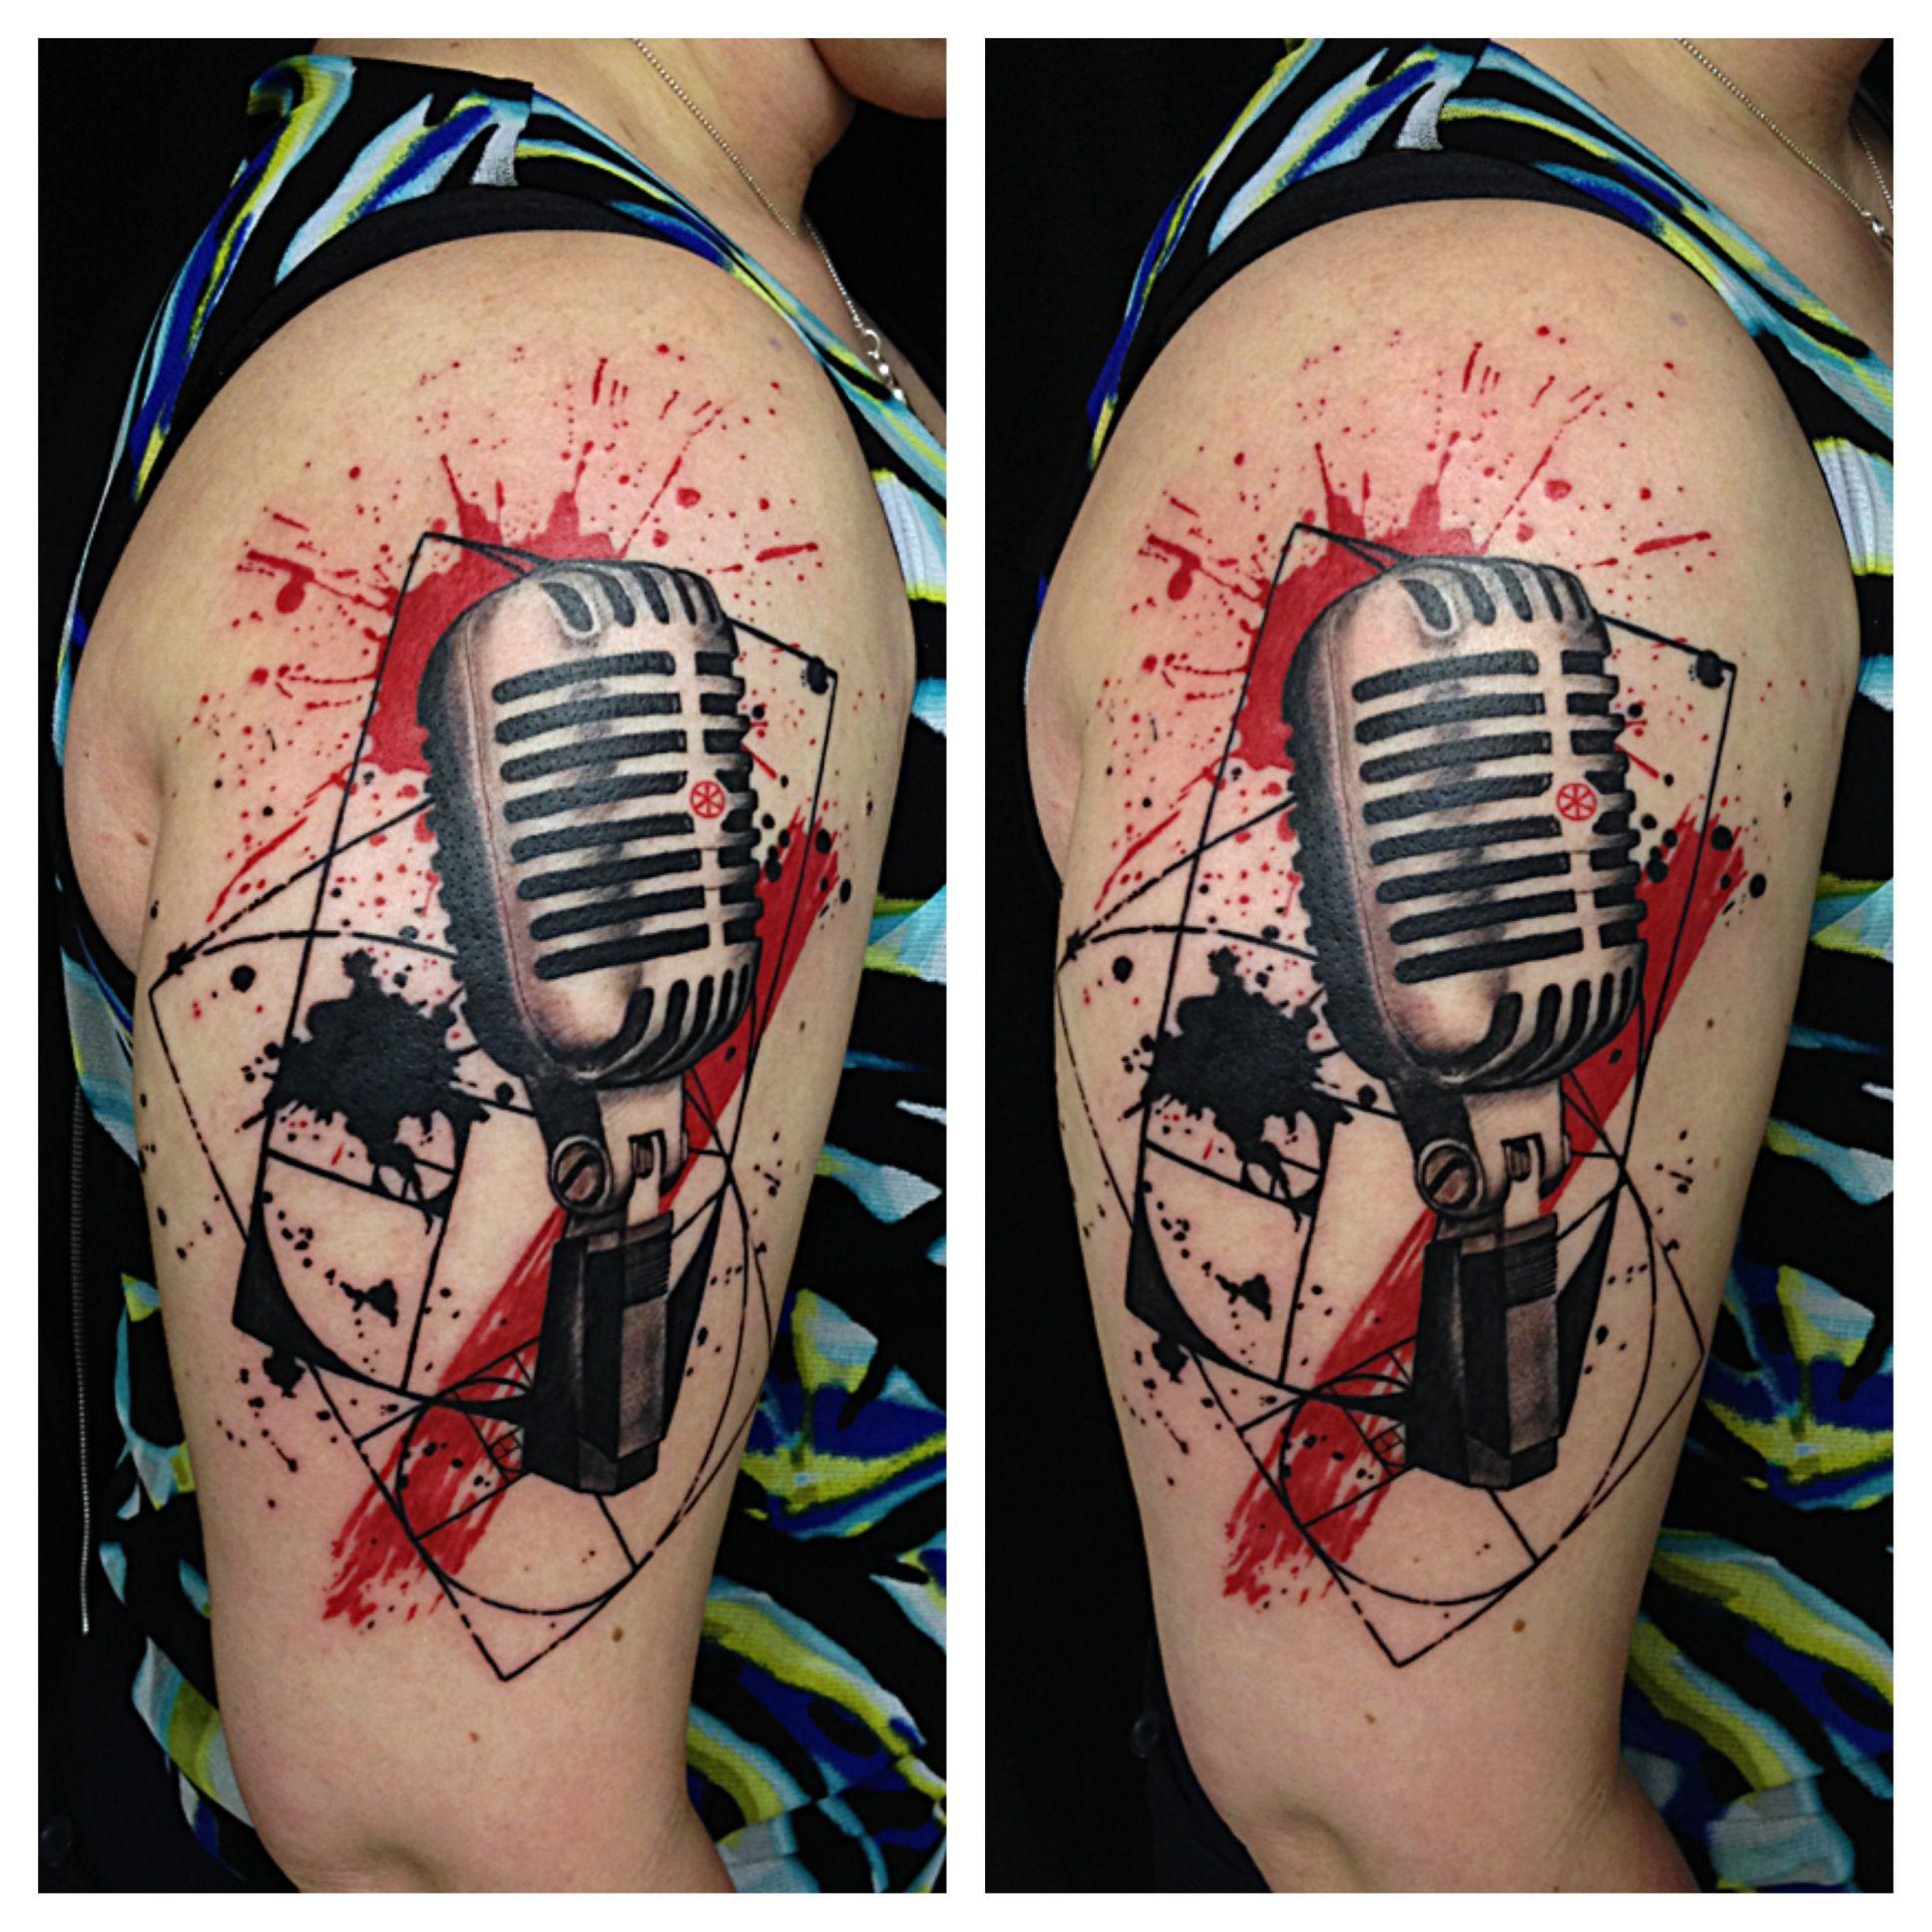 Trash Polka Tattoo: Fun Trash Polka Tattoo